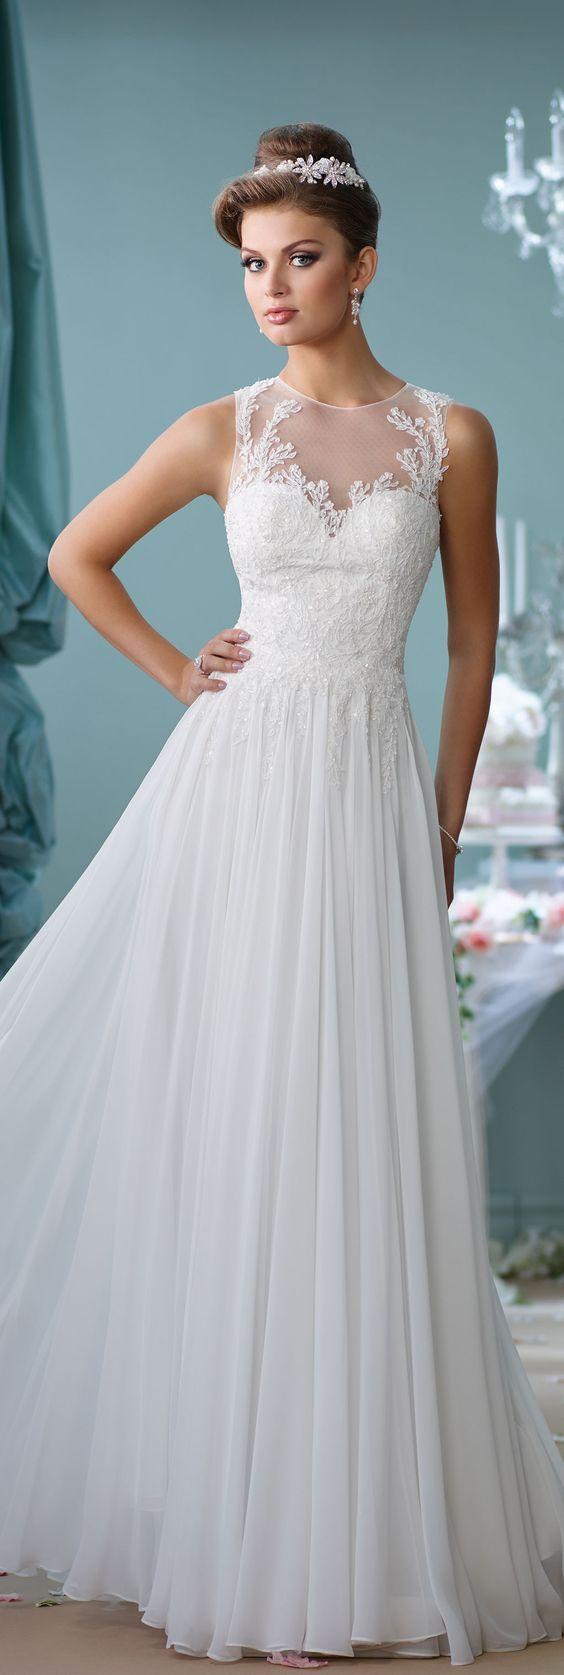 Gray dress for wedding party   best Dresses images on Pinterest  Cute dresses Flower girls